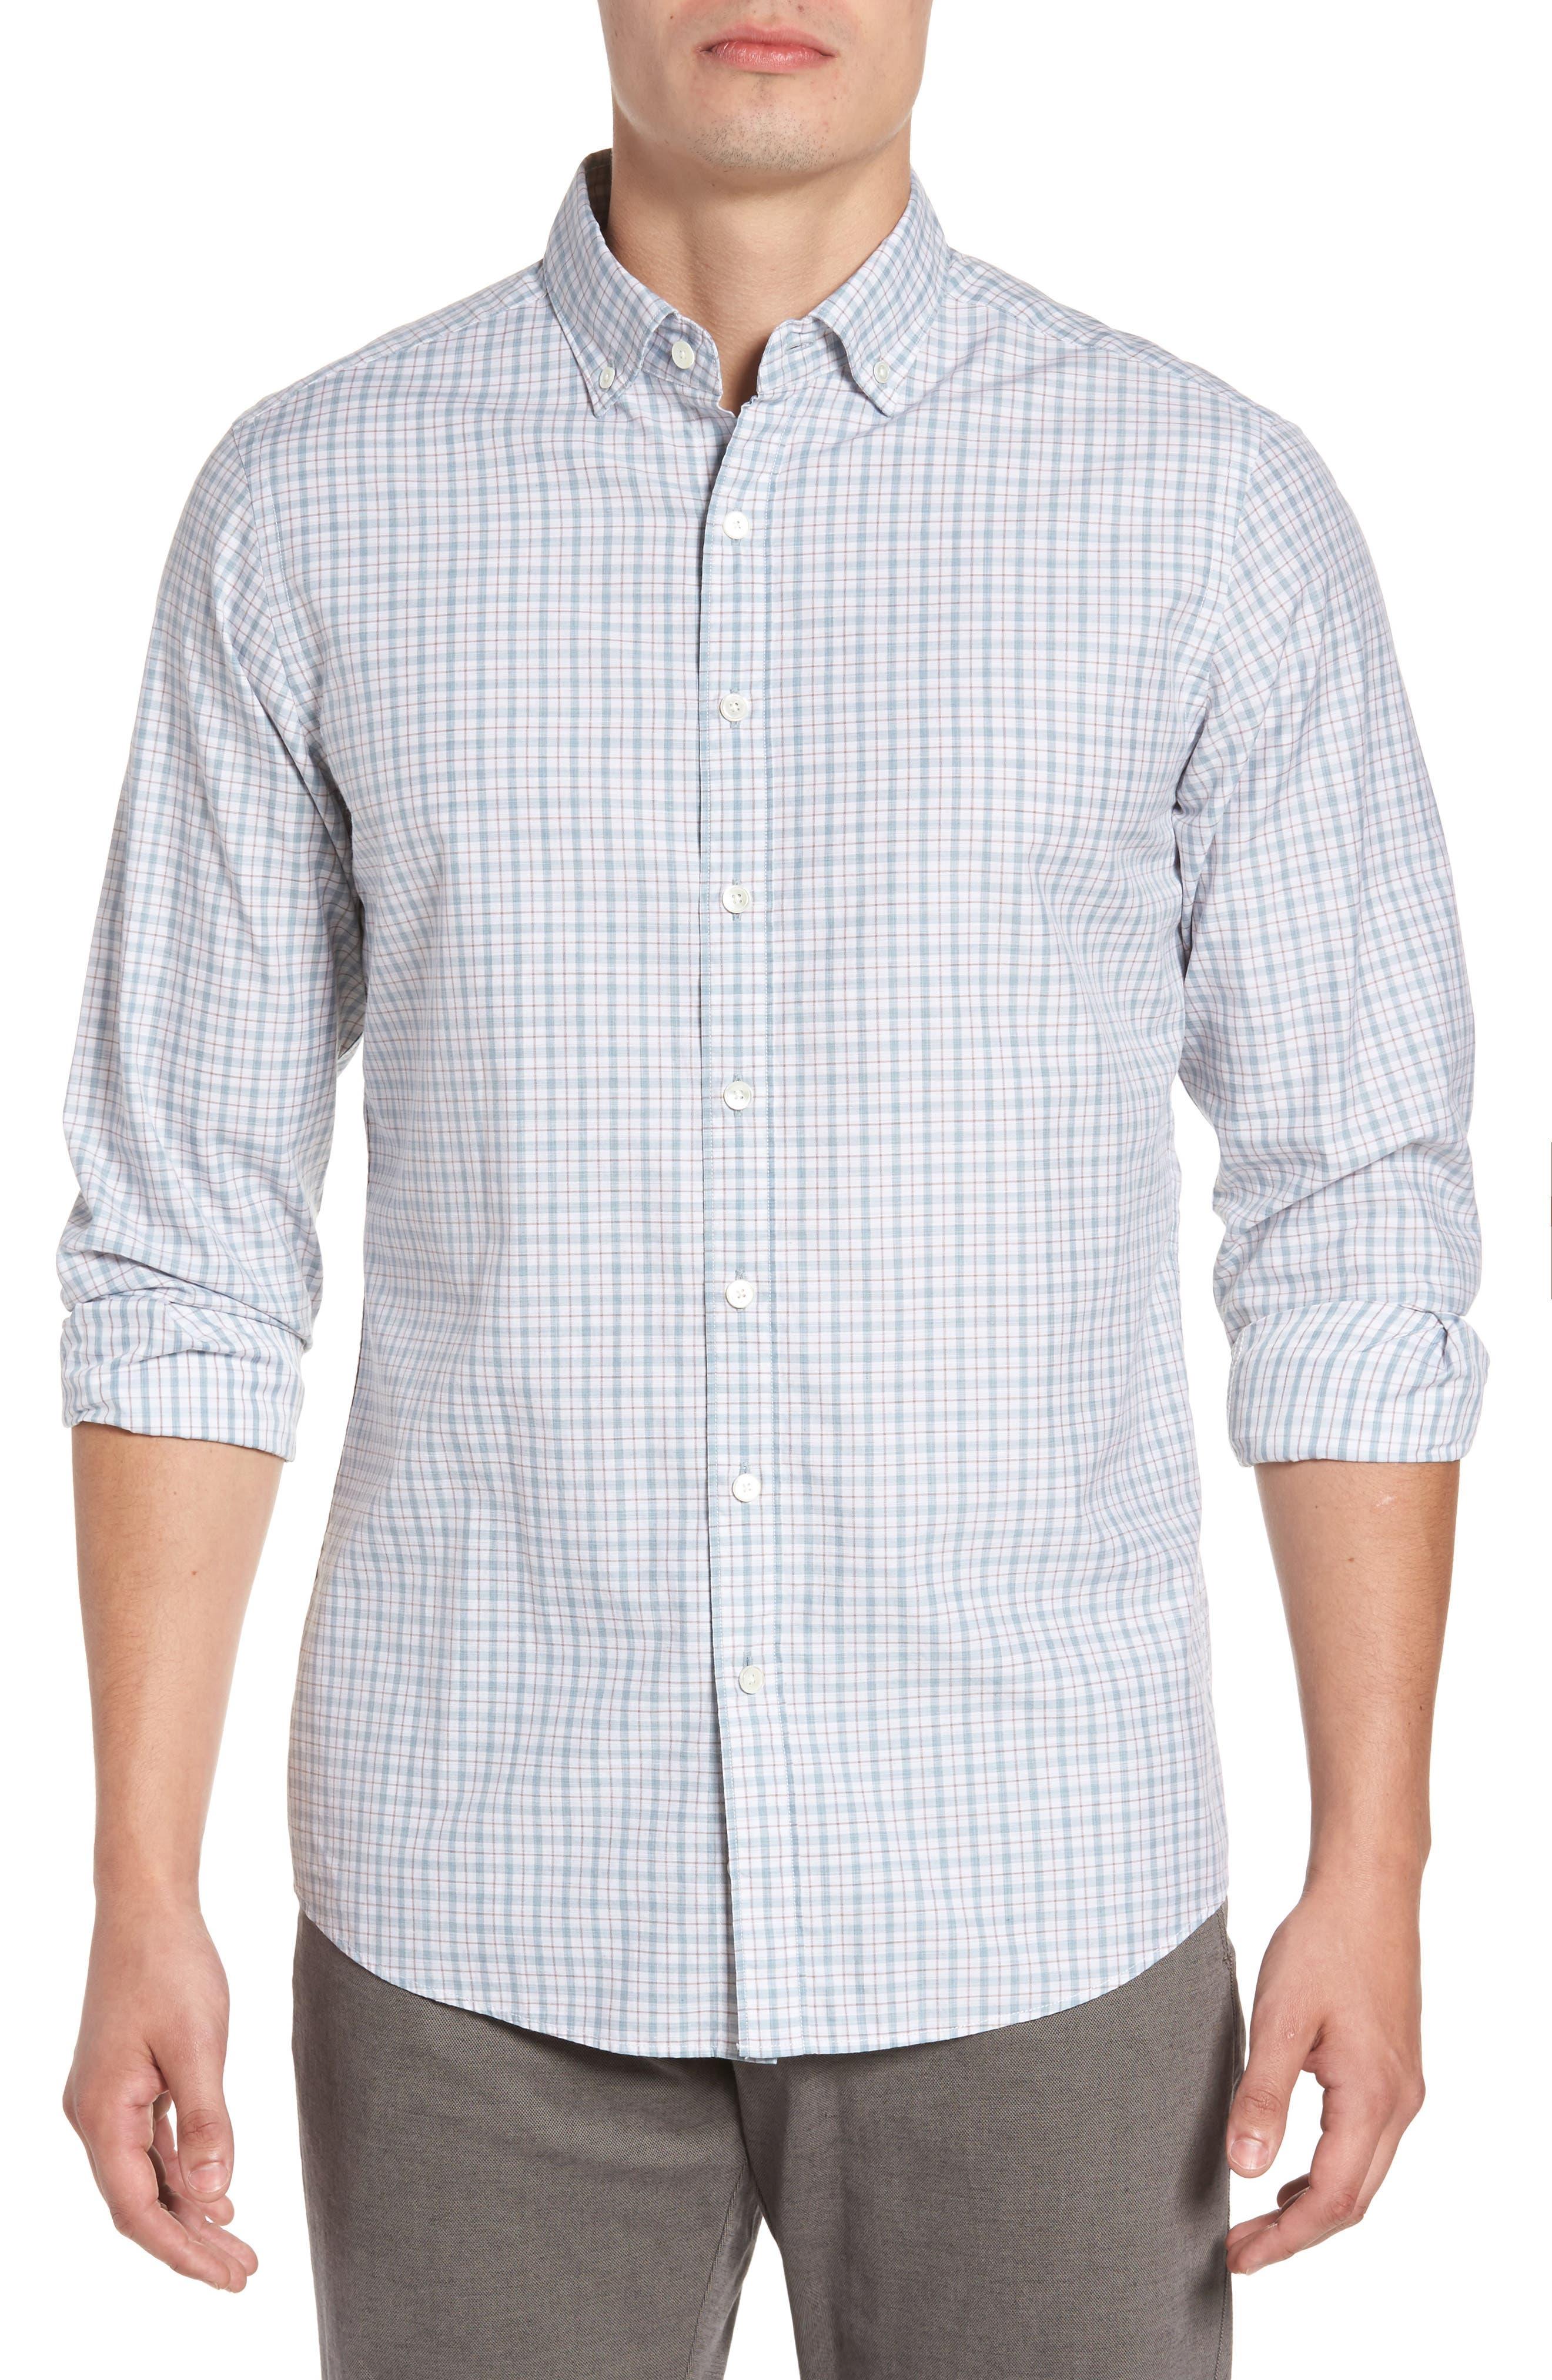 Alternate Image 1 Selected - Rodd & Gunn Carterton Sports Fit Plaid Sport Shirt